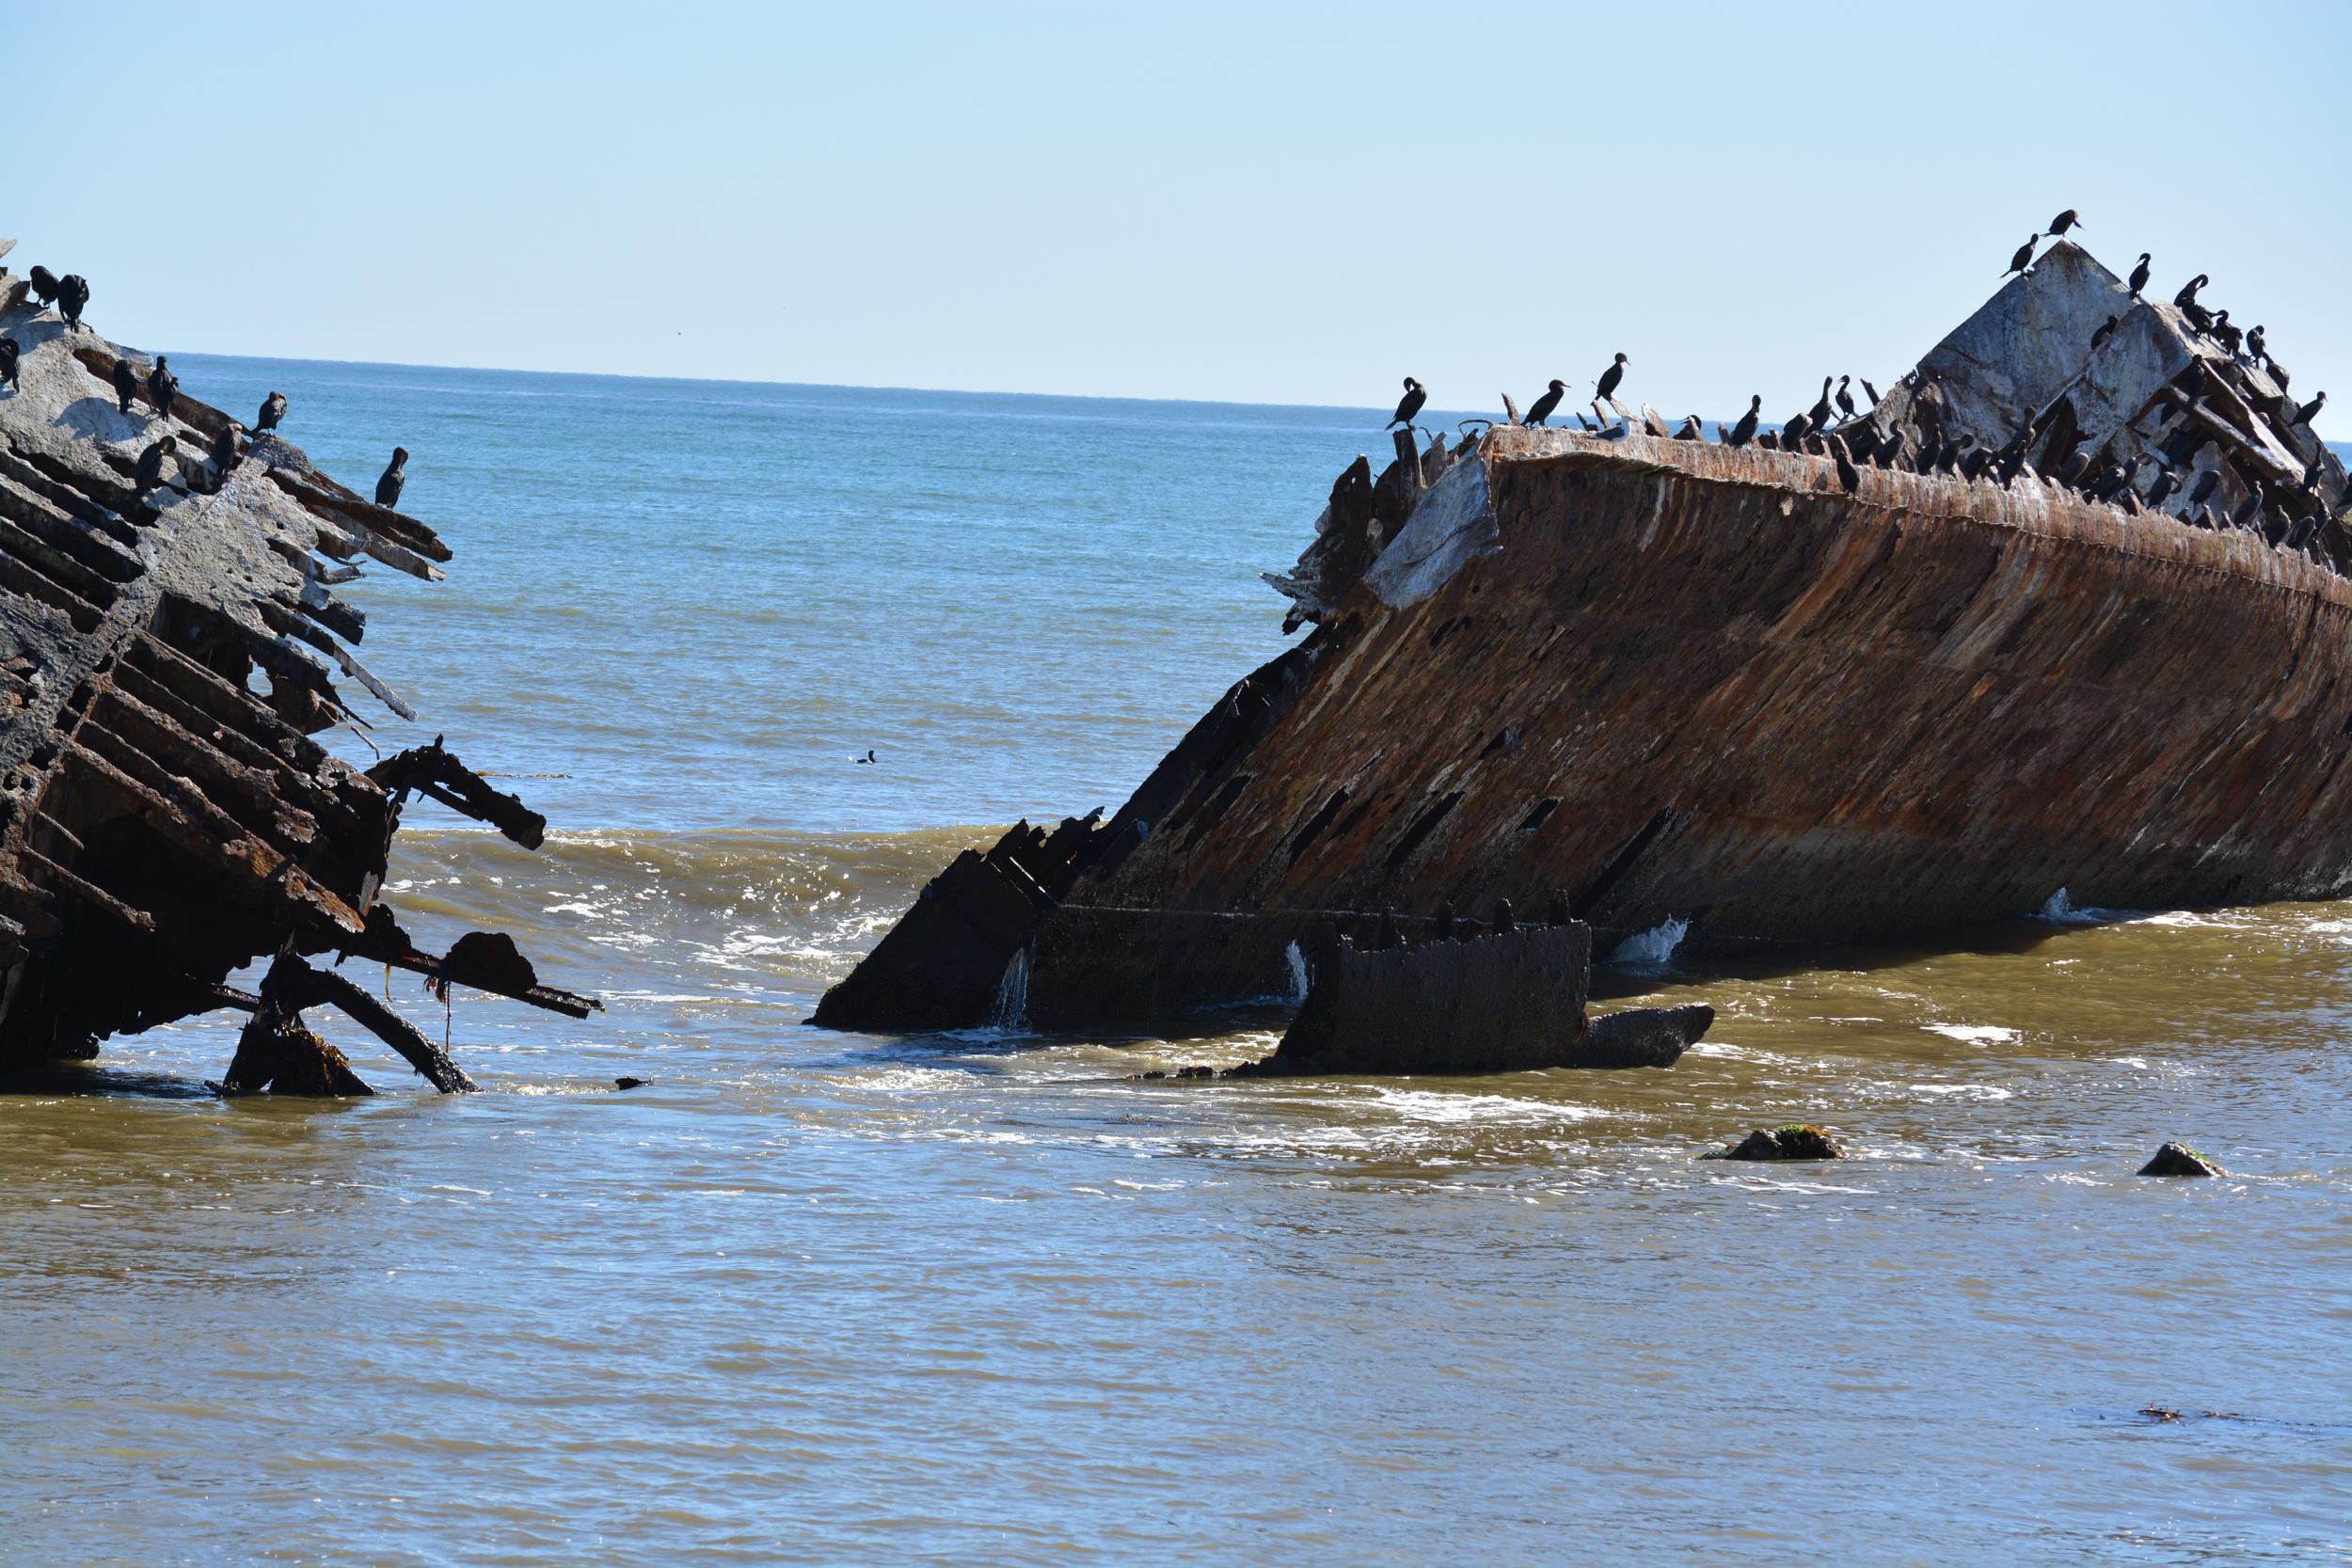 Baja California 10-5-13 Shipwrecks Surfing Adventure Ocean Experience Surf School San Diego (73).JPG